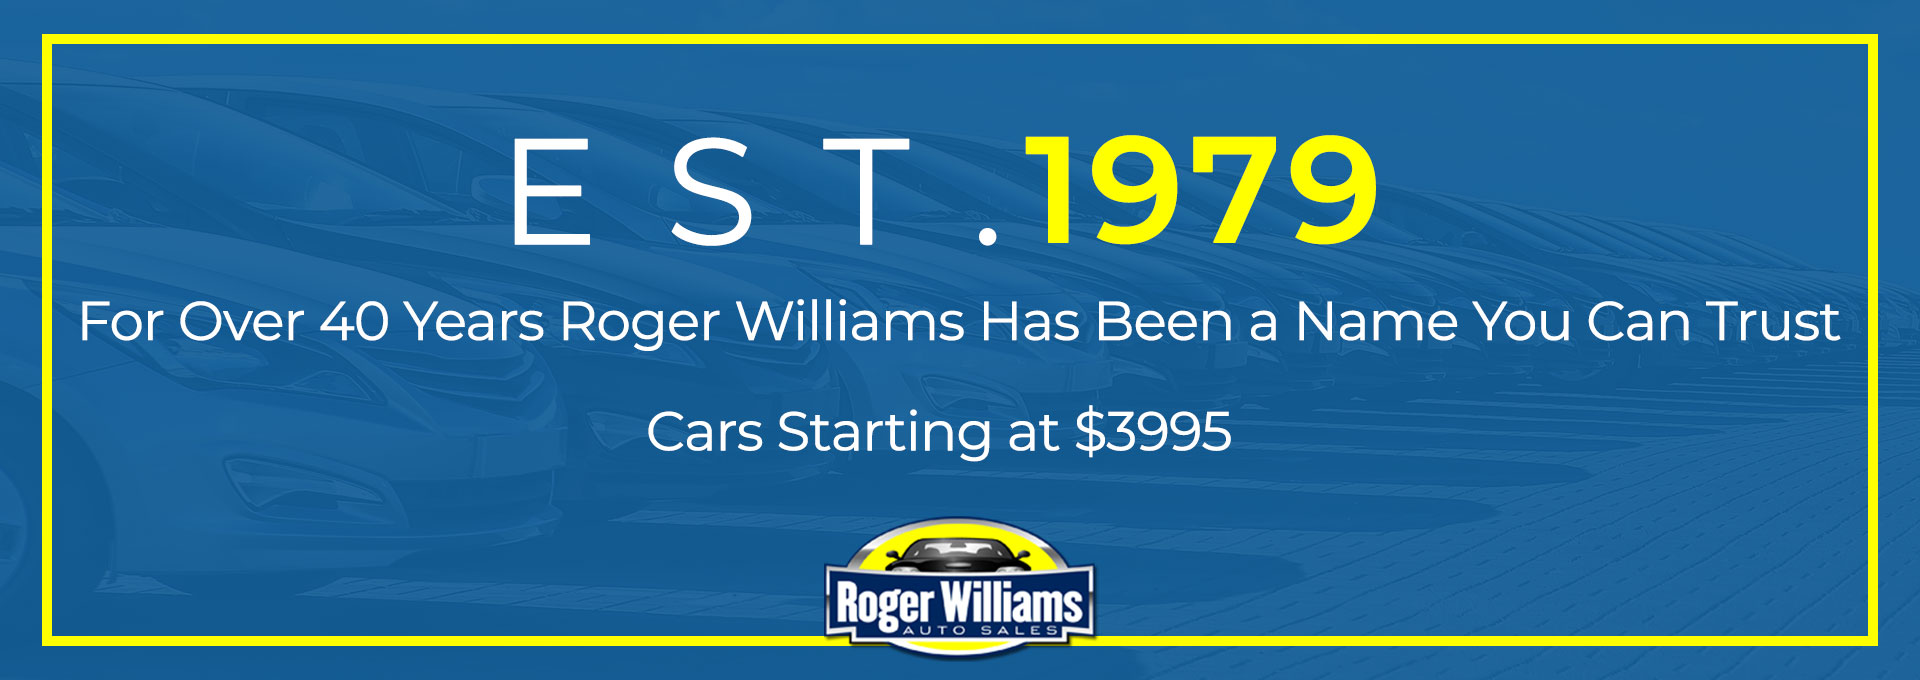 Happy 40th Anniversary to Roger Williams Auto Sales